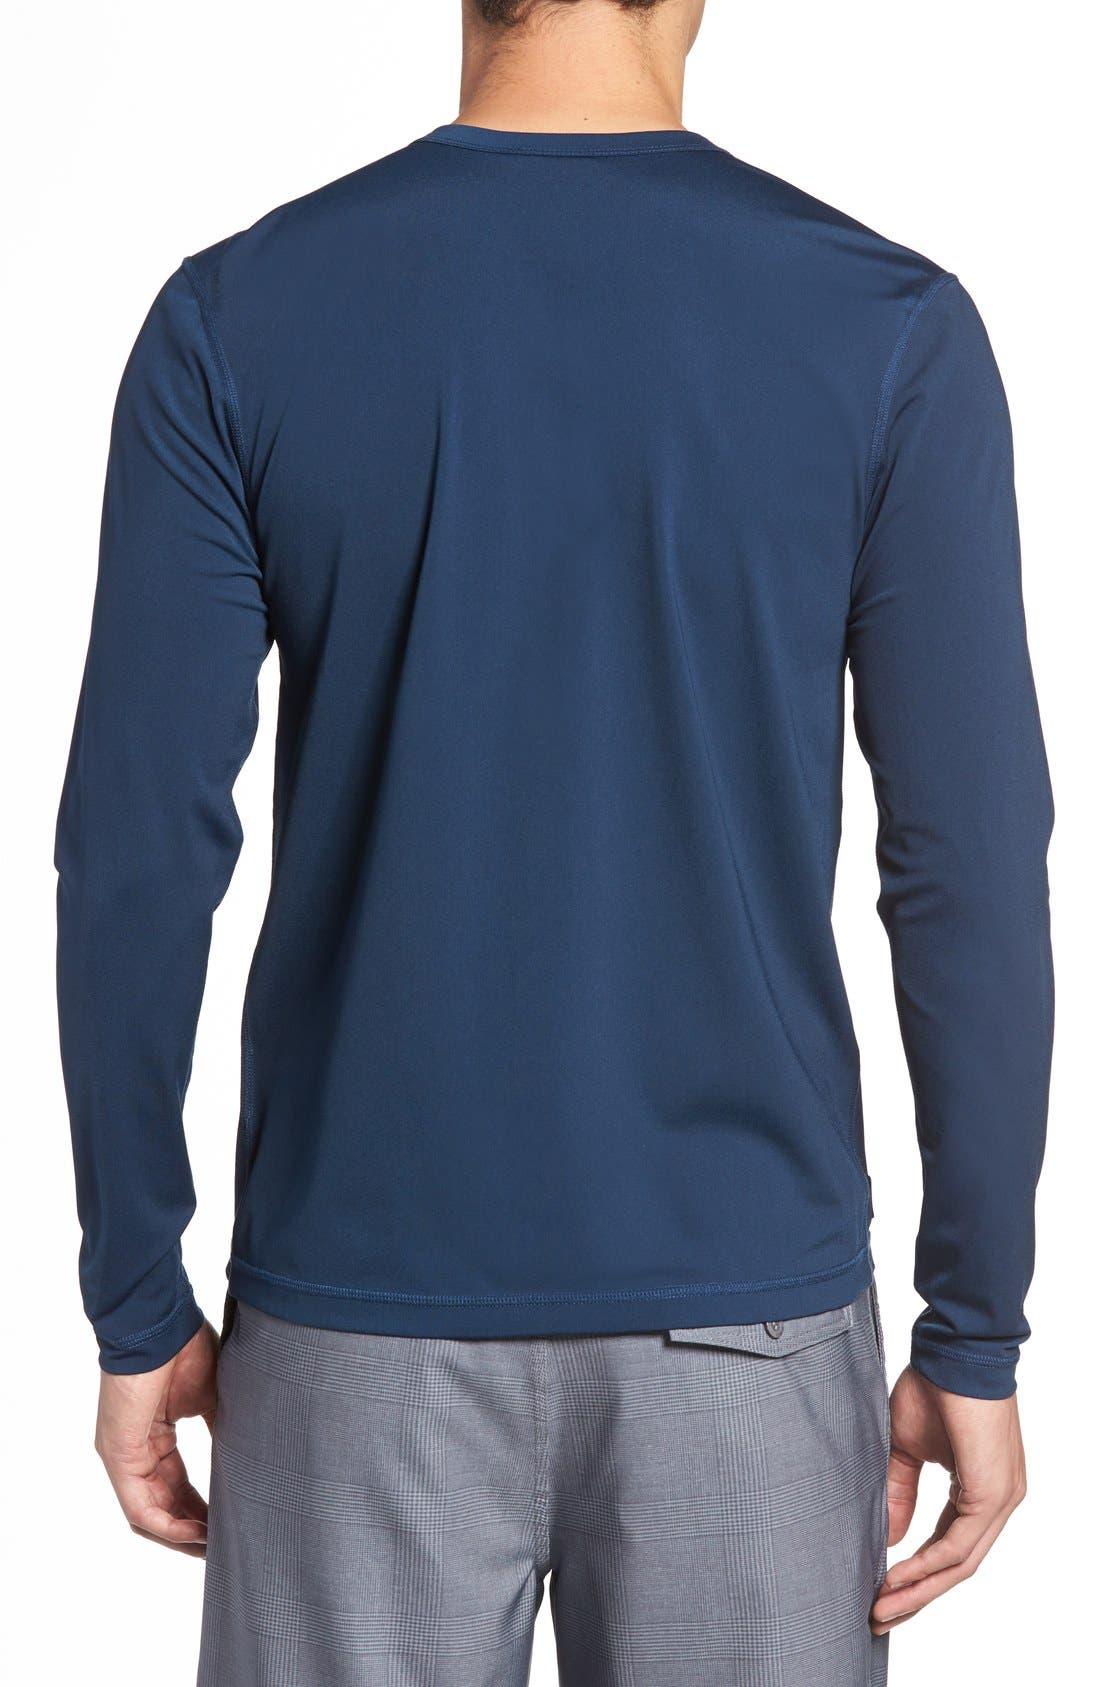 Long Sleeve Stretch Rashguard,                             Alternate thumbnail 6, color,                             DEEP BLUE